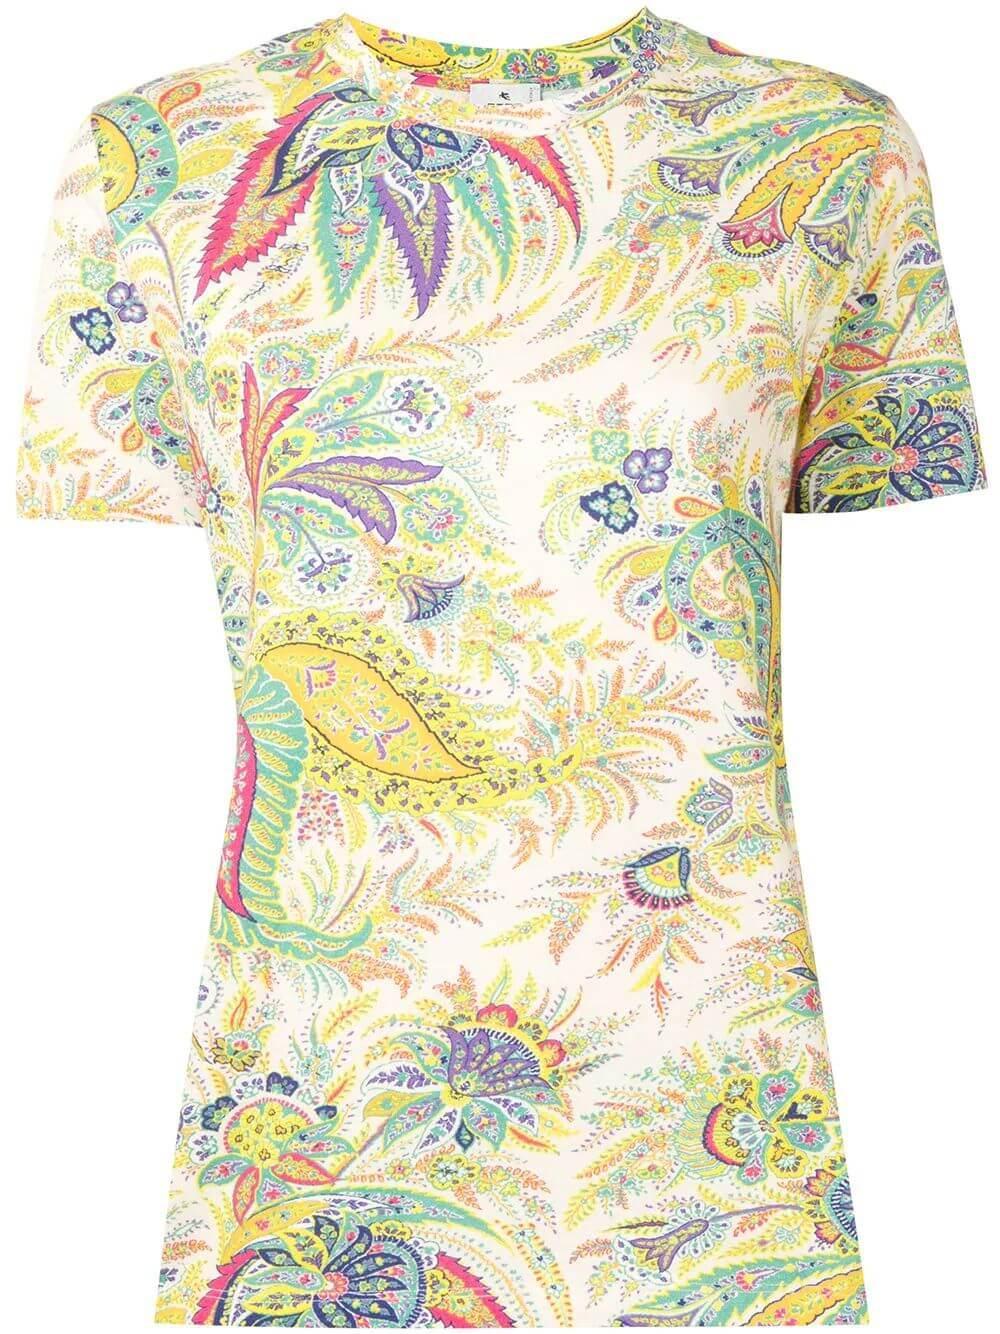 Paisley Print T- Shirt Item # 211D145169489